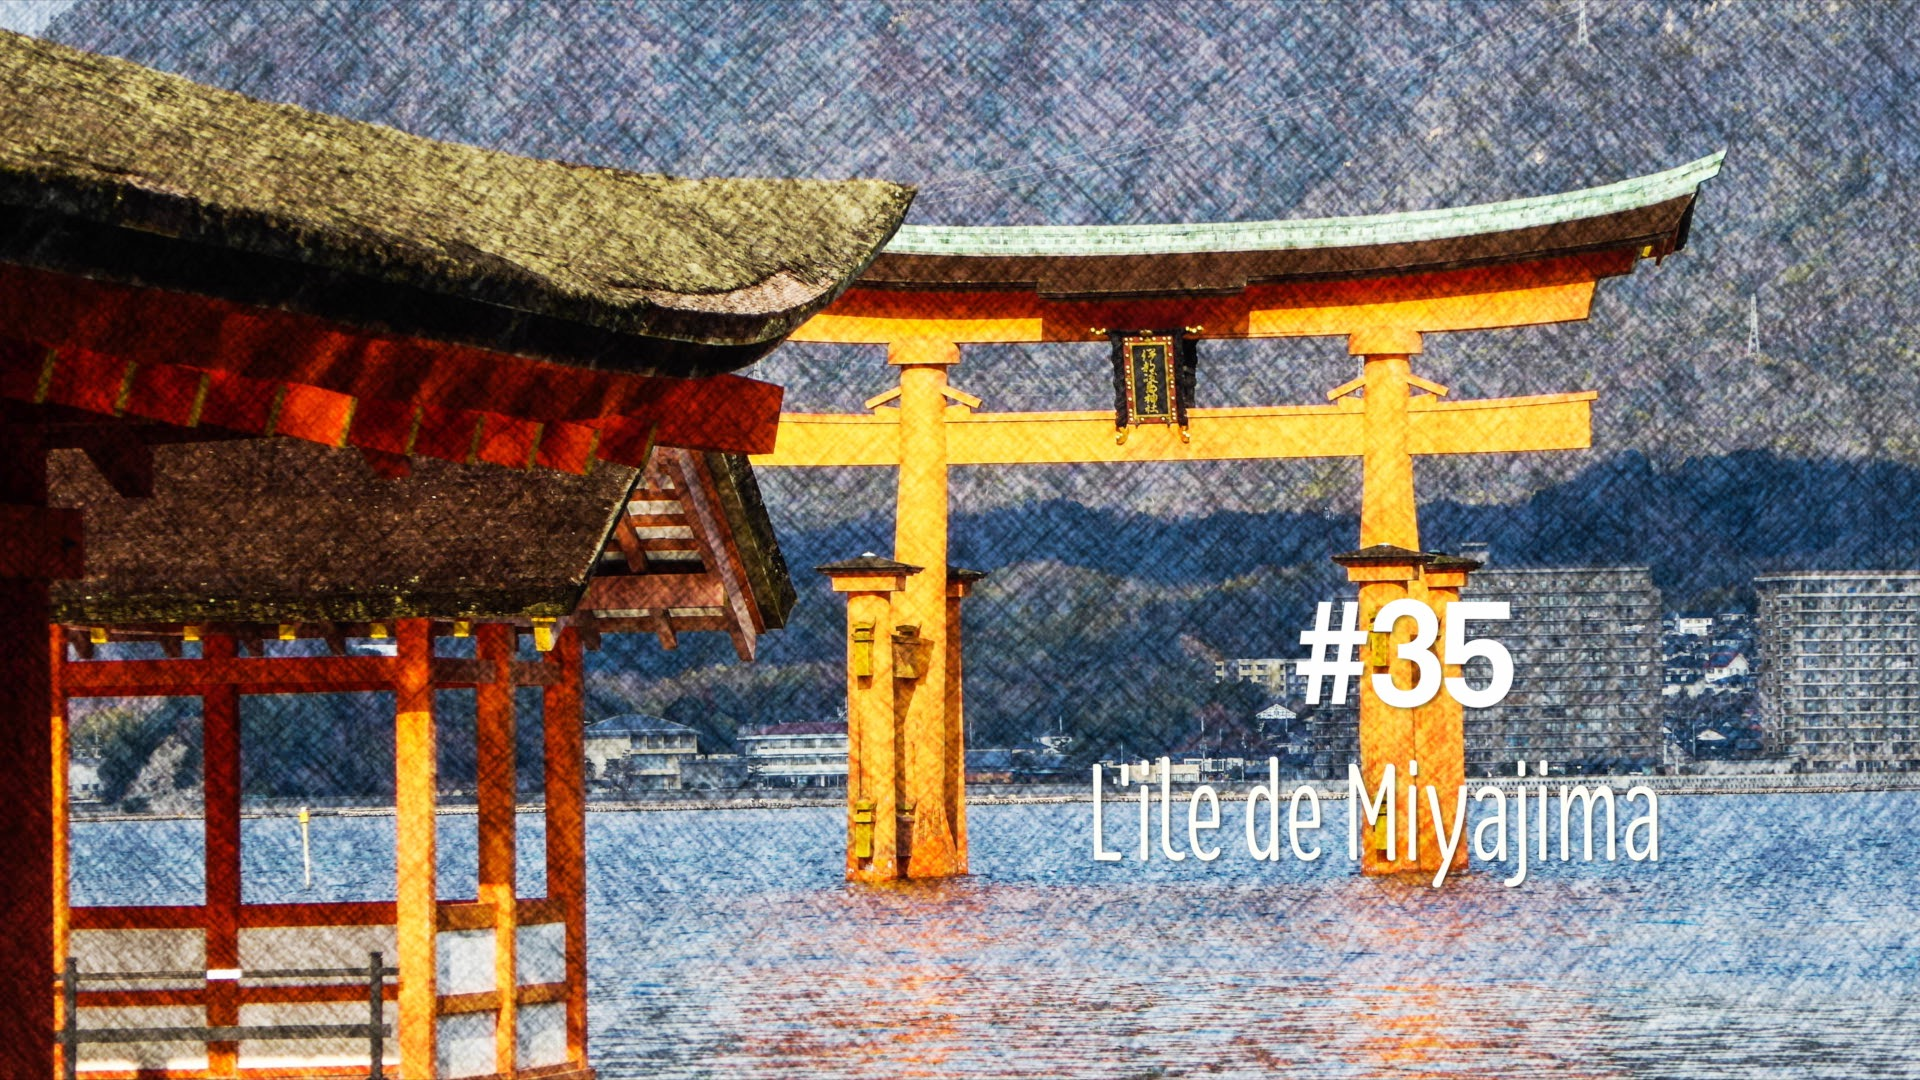 L'ile de Miyajima (#35)